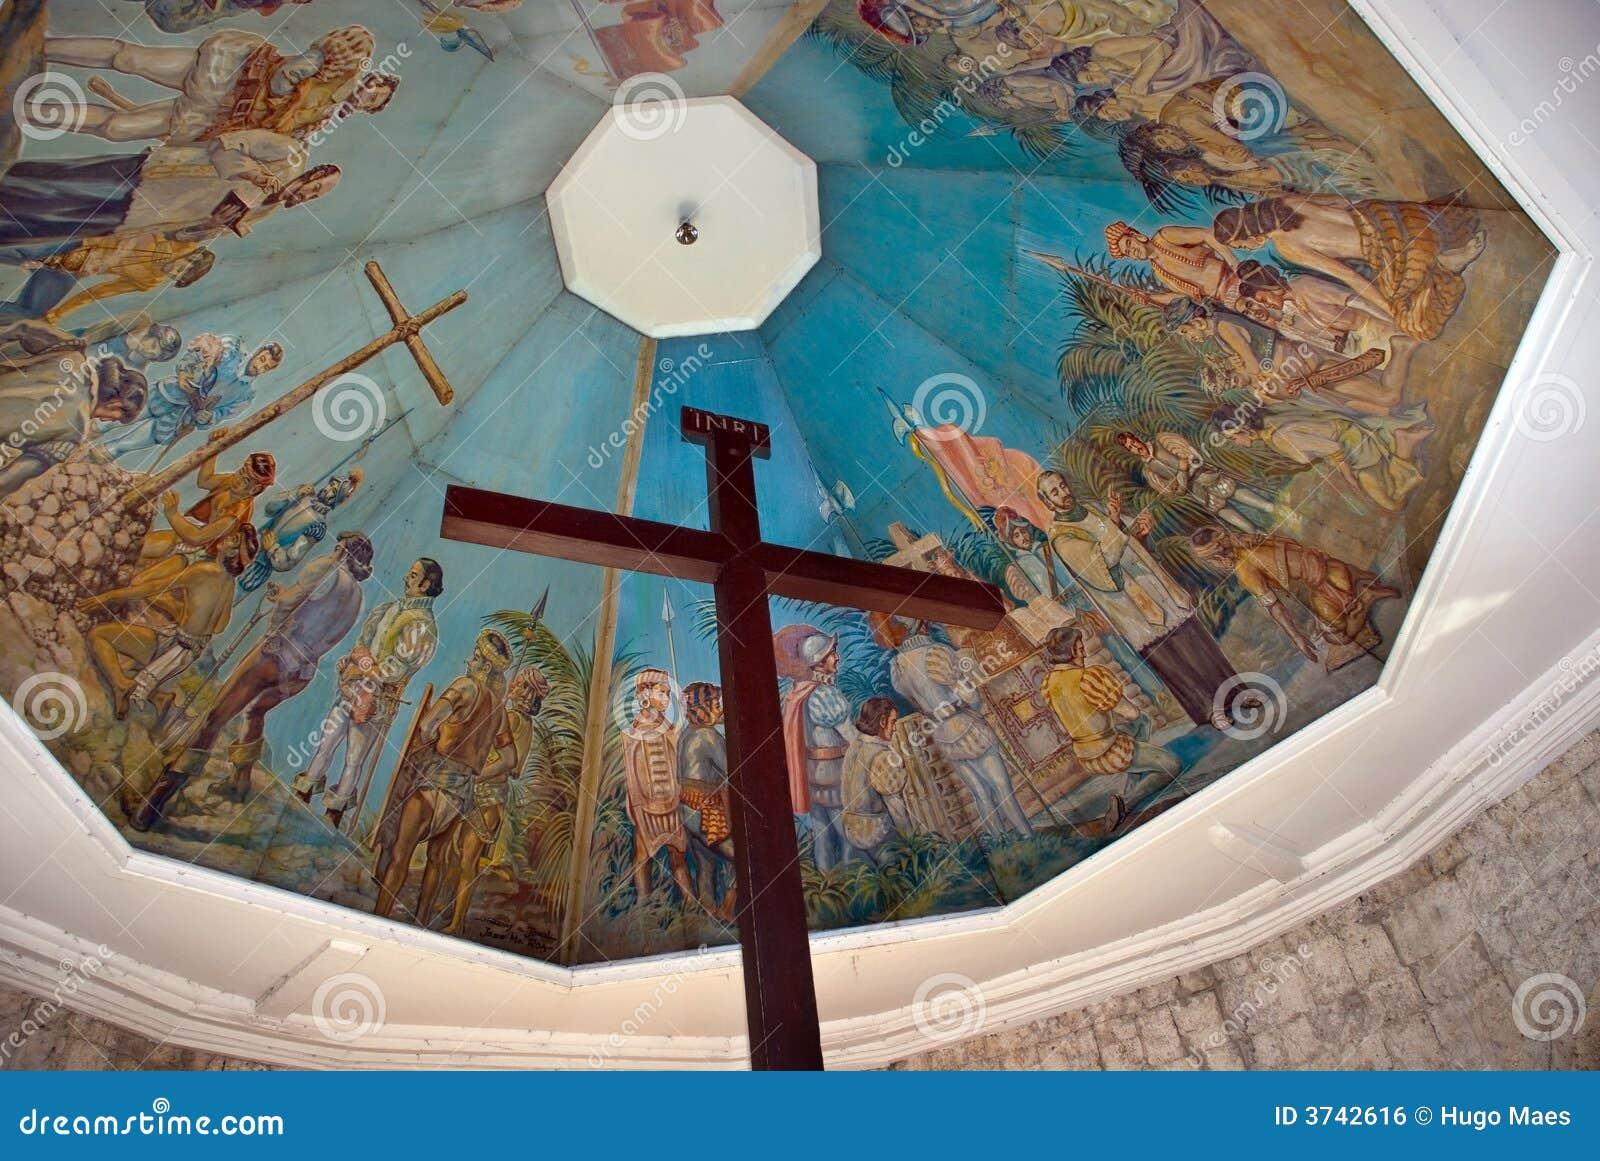 Borne limite historique de Cebu : La croix de Magellan